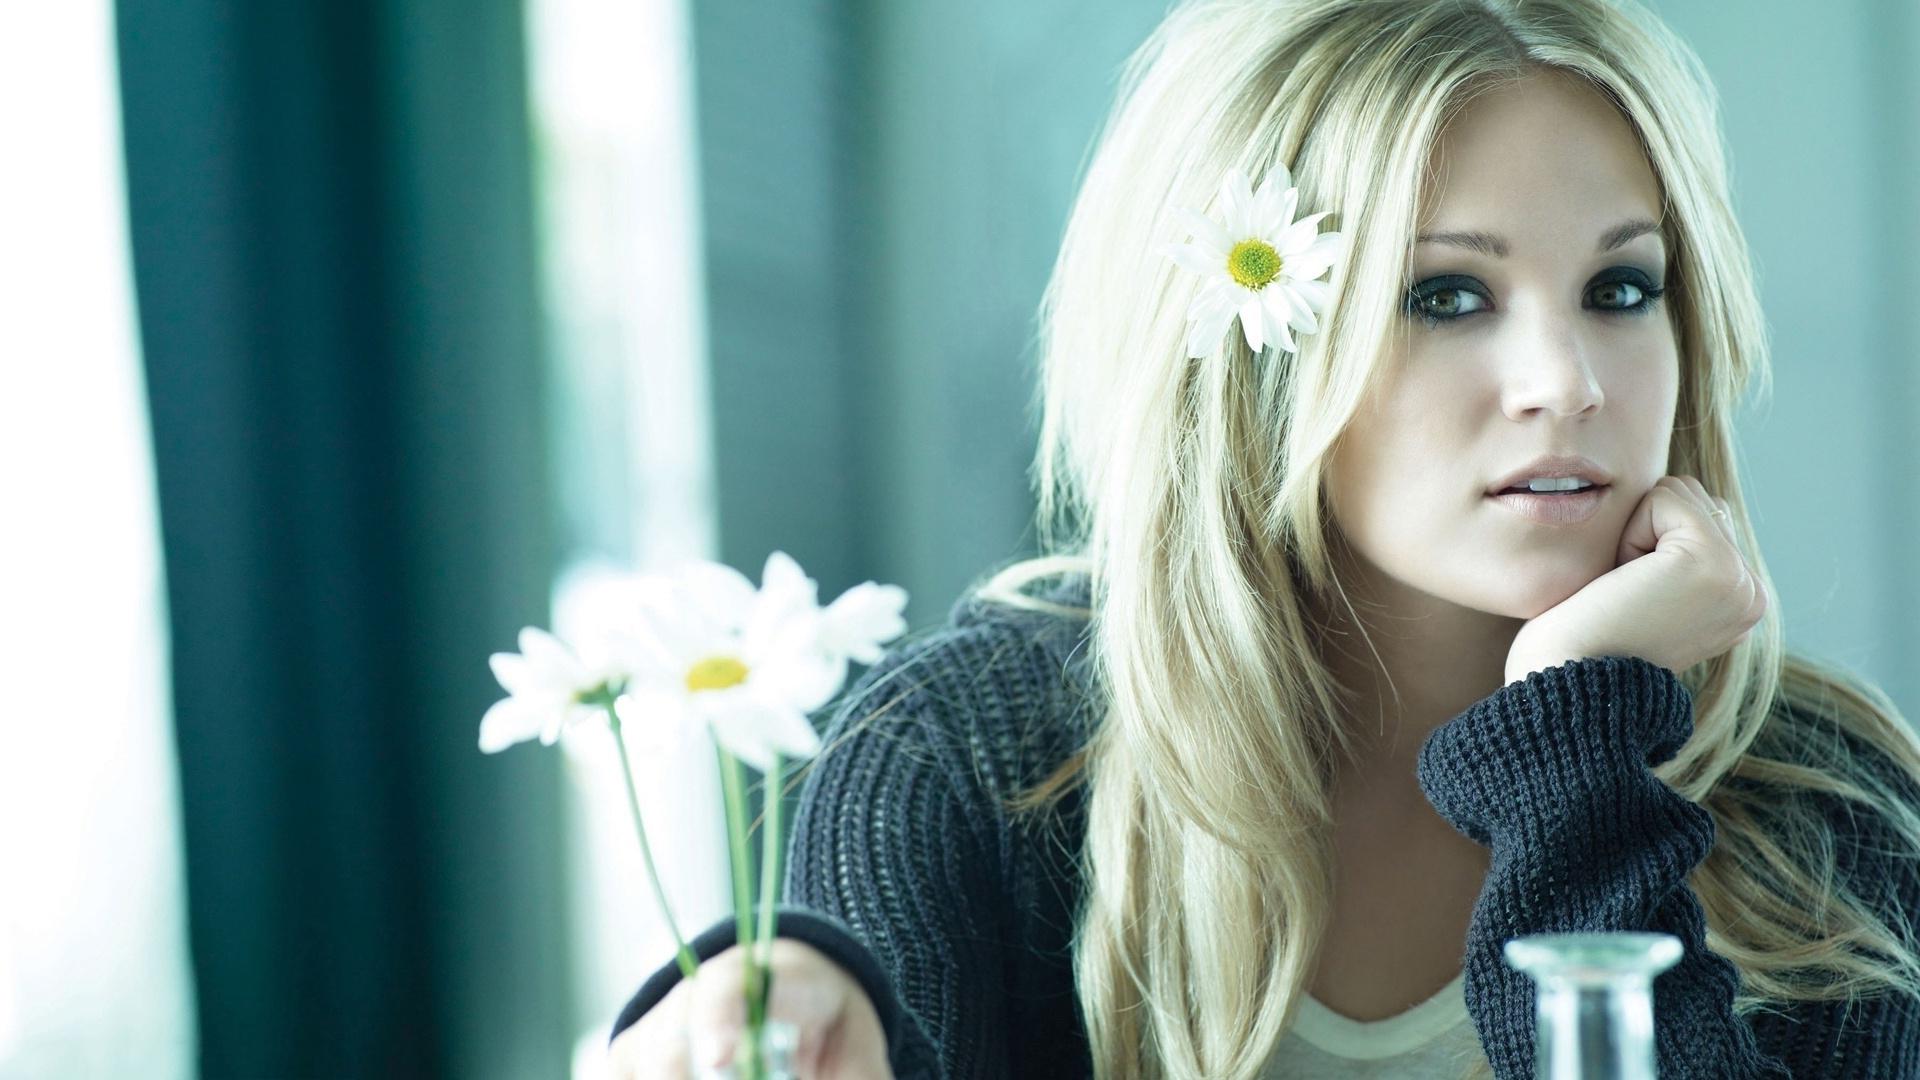 Blonde Carrie Underwood Singer Actress Photo